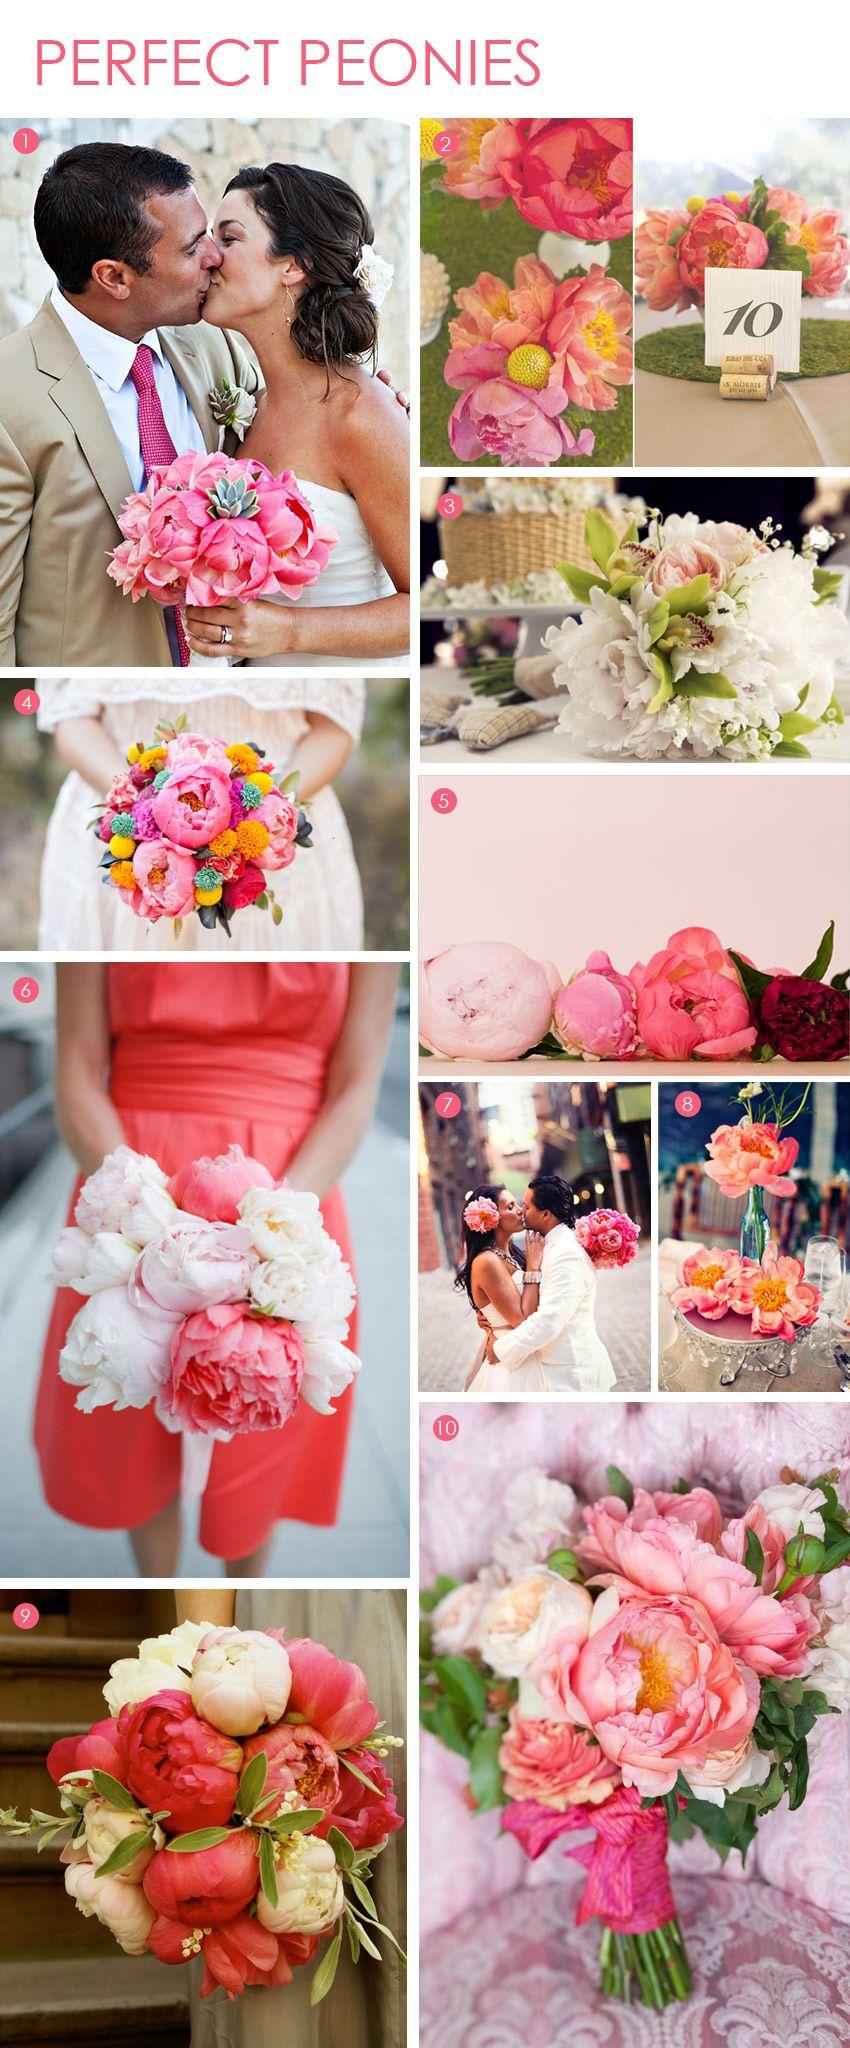 Bouquet Bar Perfect Peonies Wedding flowers, Wedding